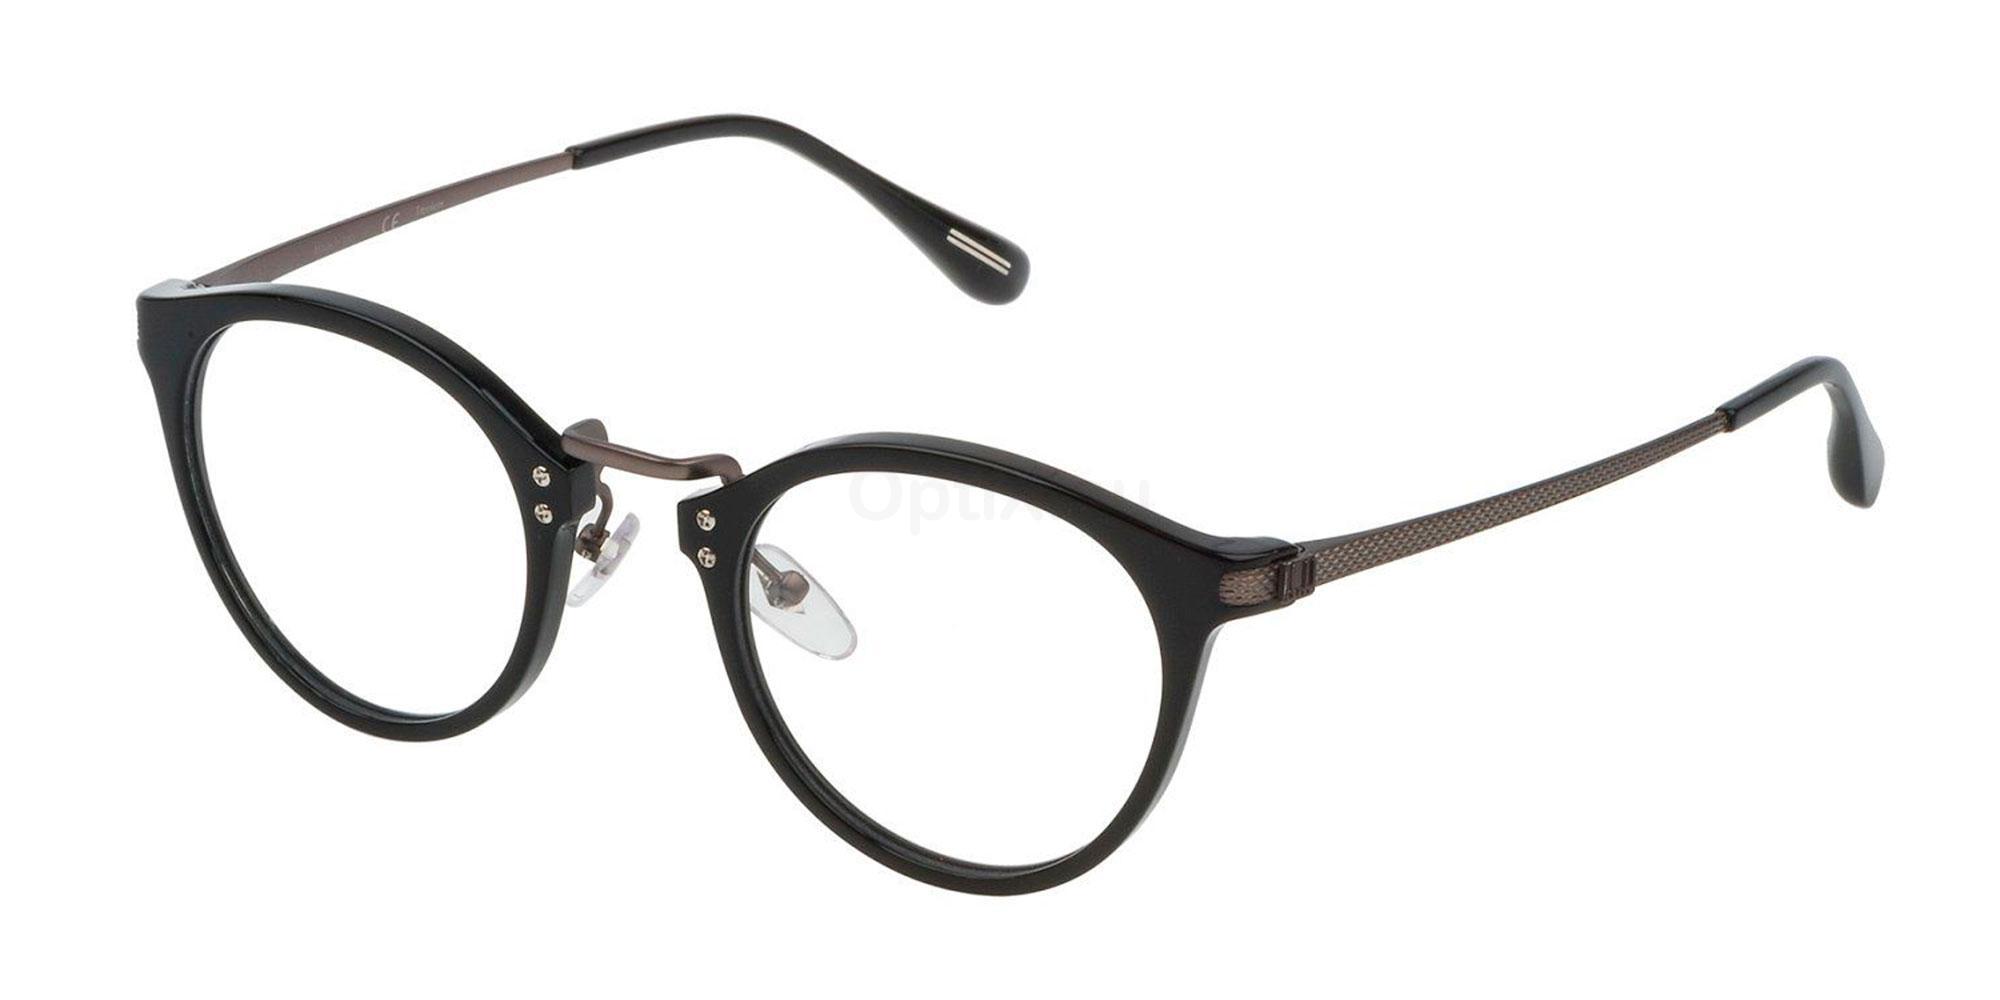 0700 VDH114G Glasses, Dunhill London